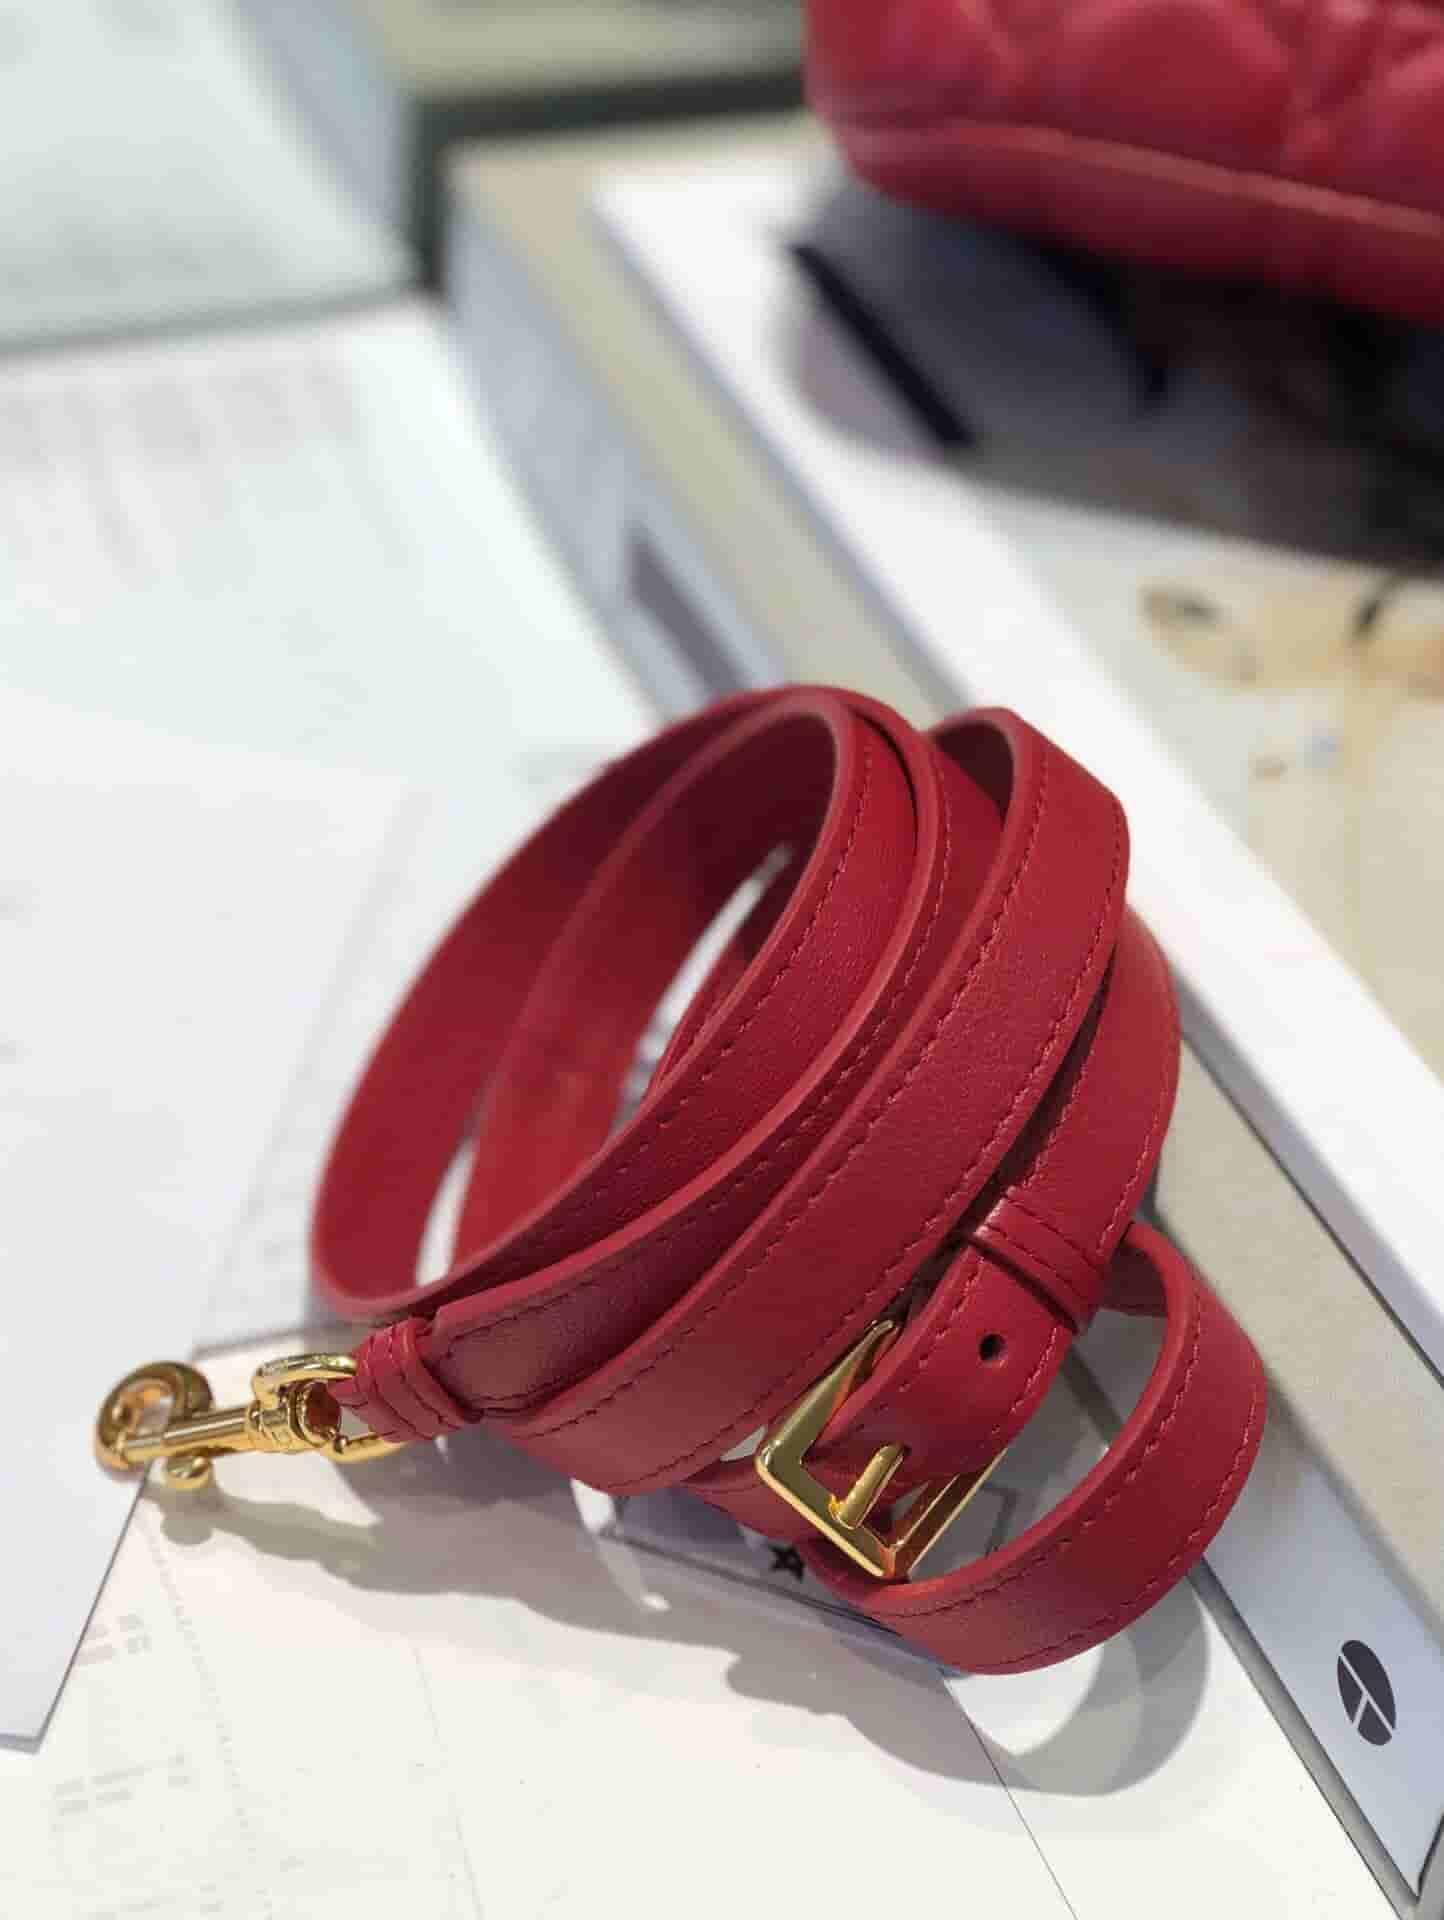 Dior Travel红色羊皮藤格纹单肩手提化妆包 S5488UNTR_M53R